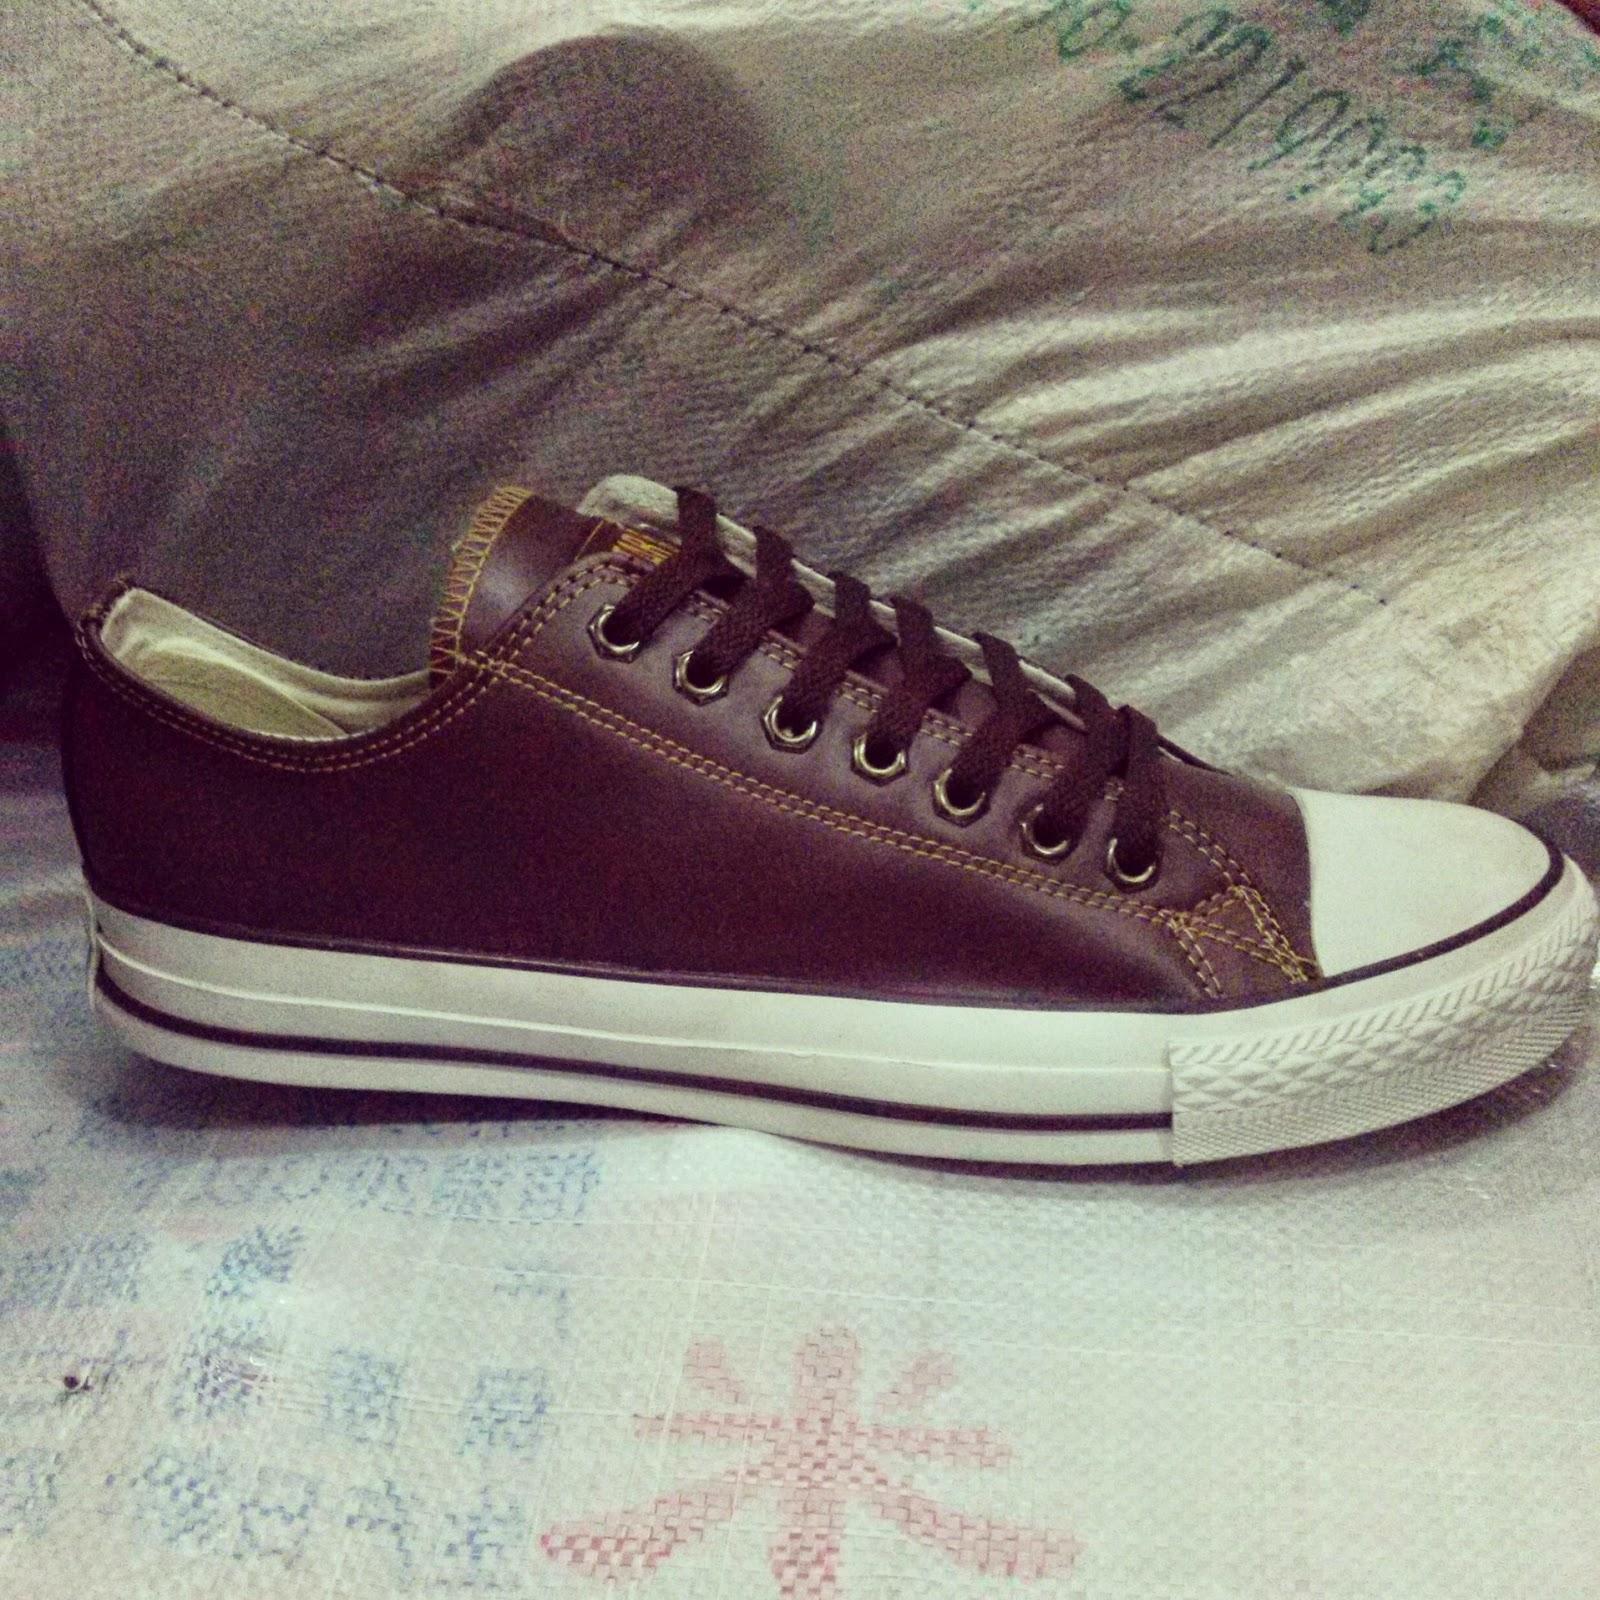 sepatu converse low bahan kulit ori vietnam